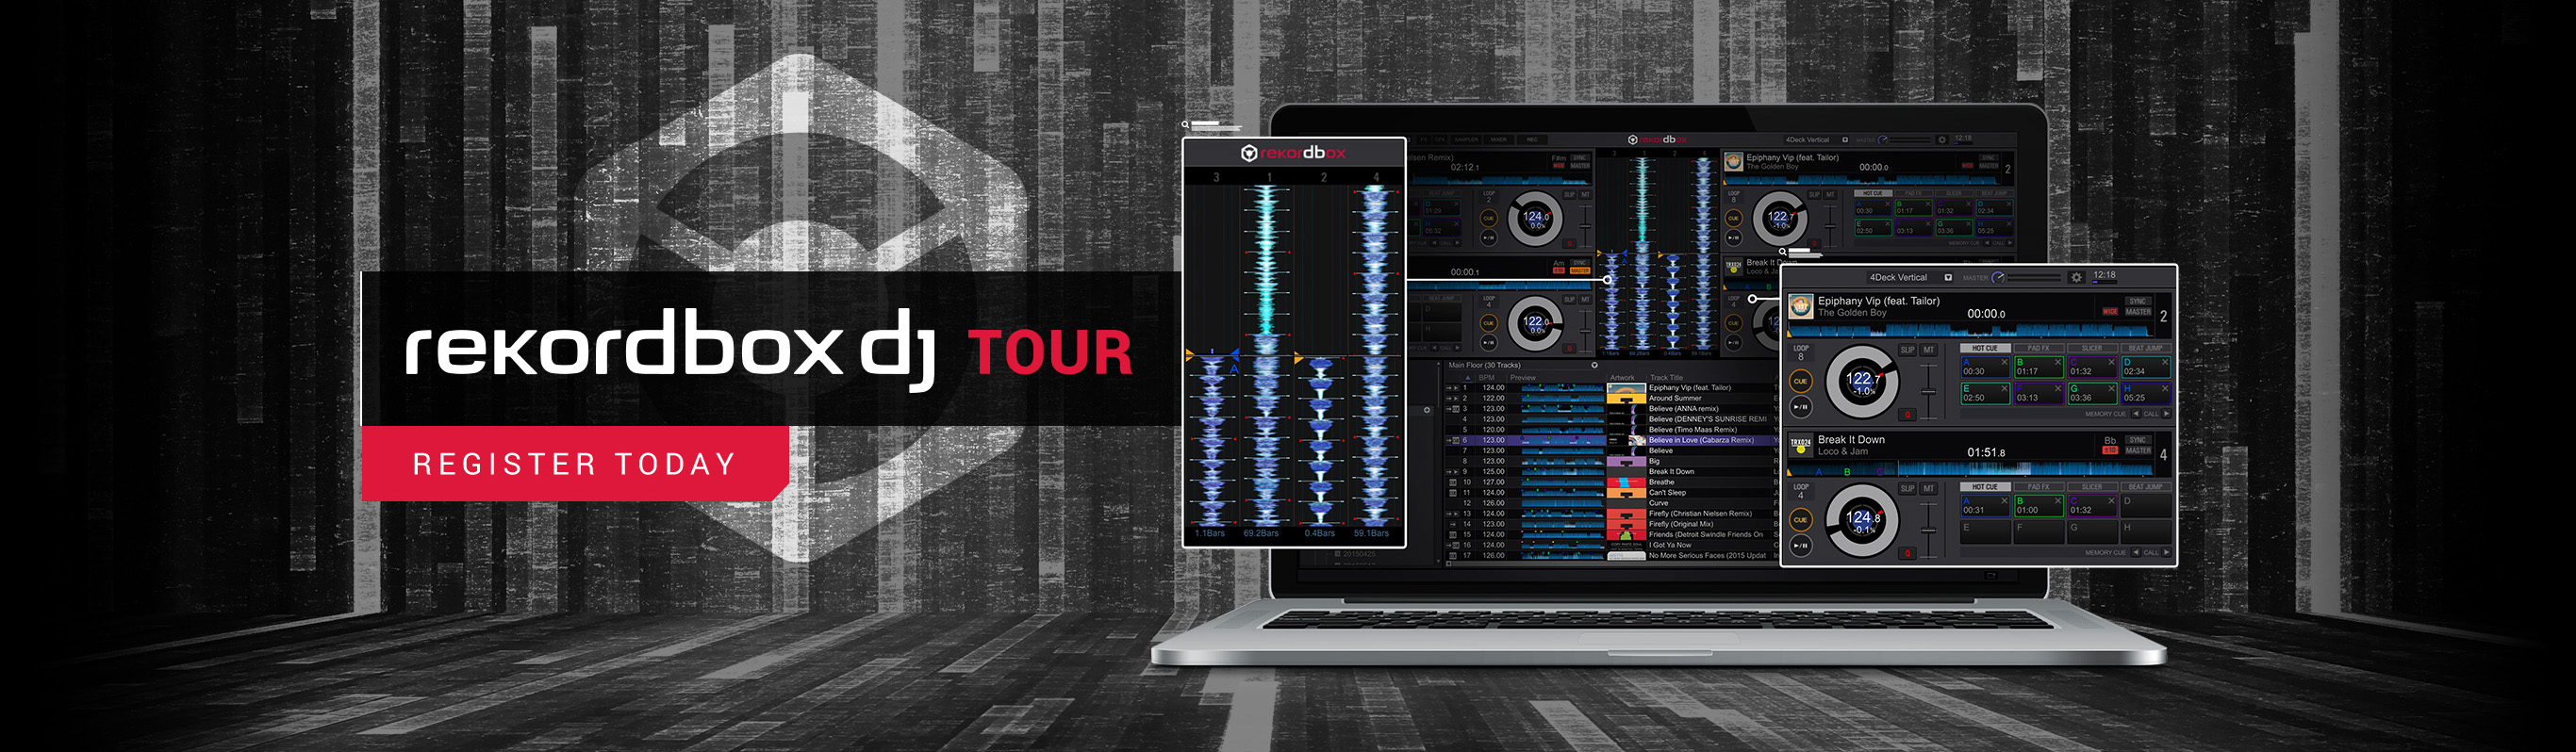 2015-rekordbox-tour